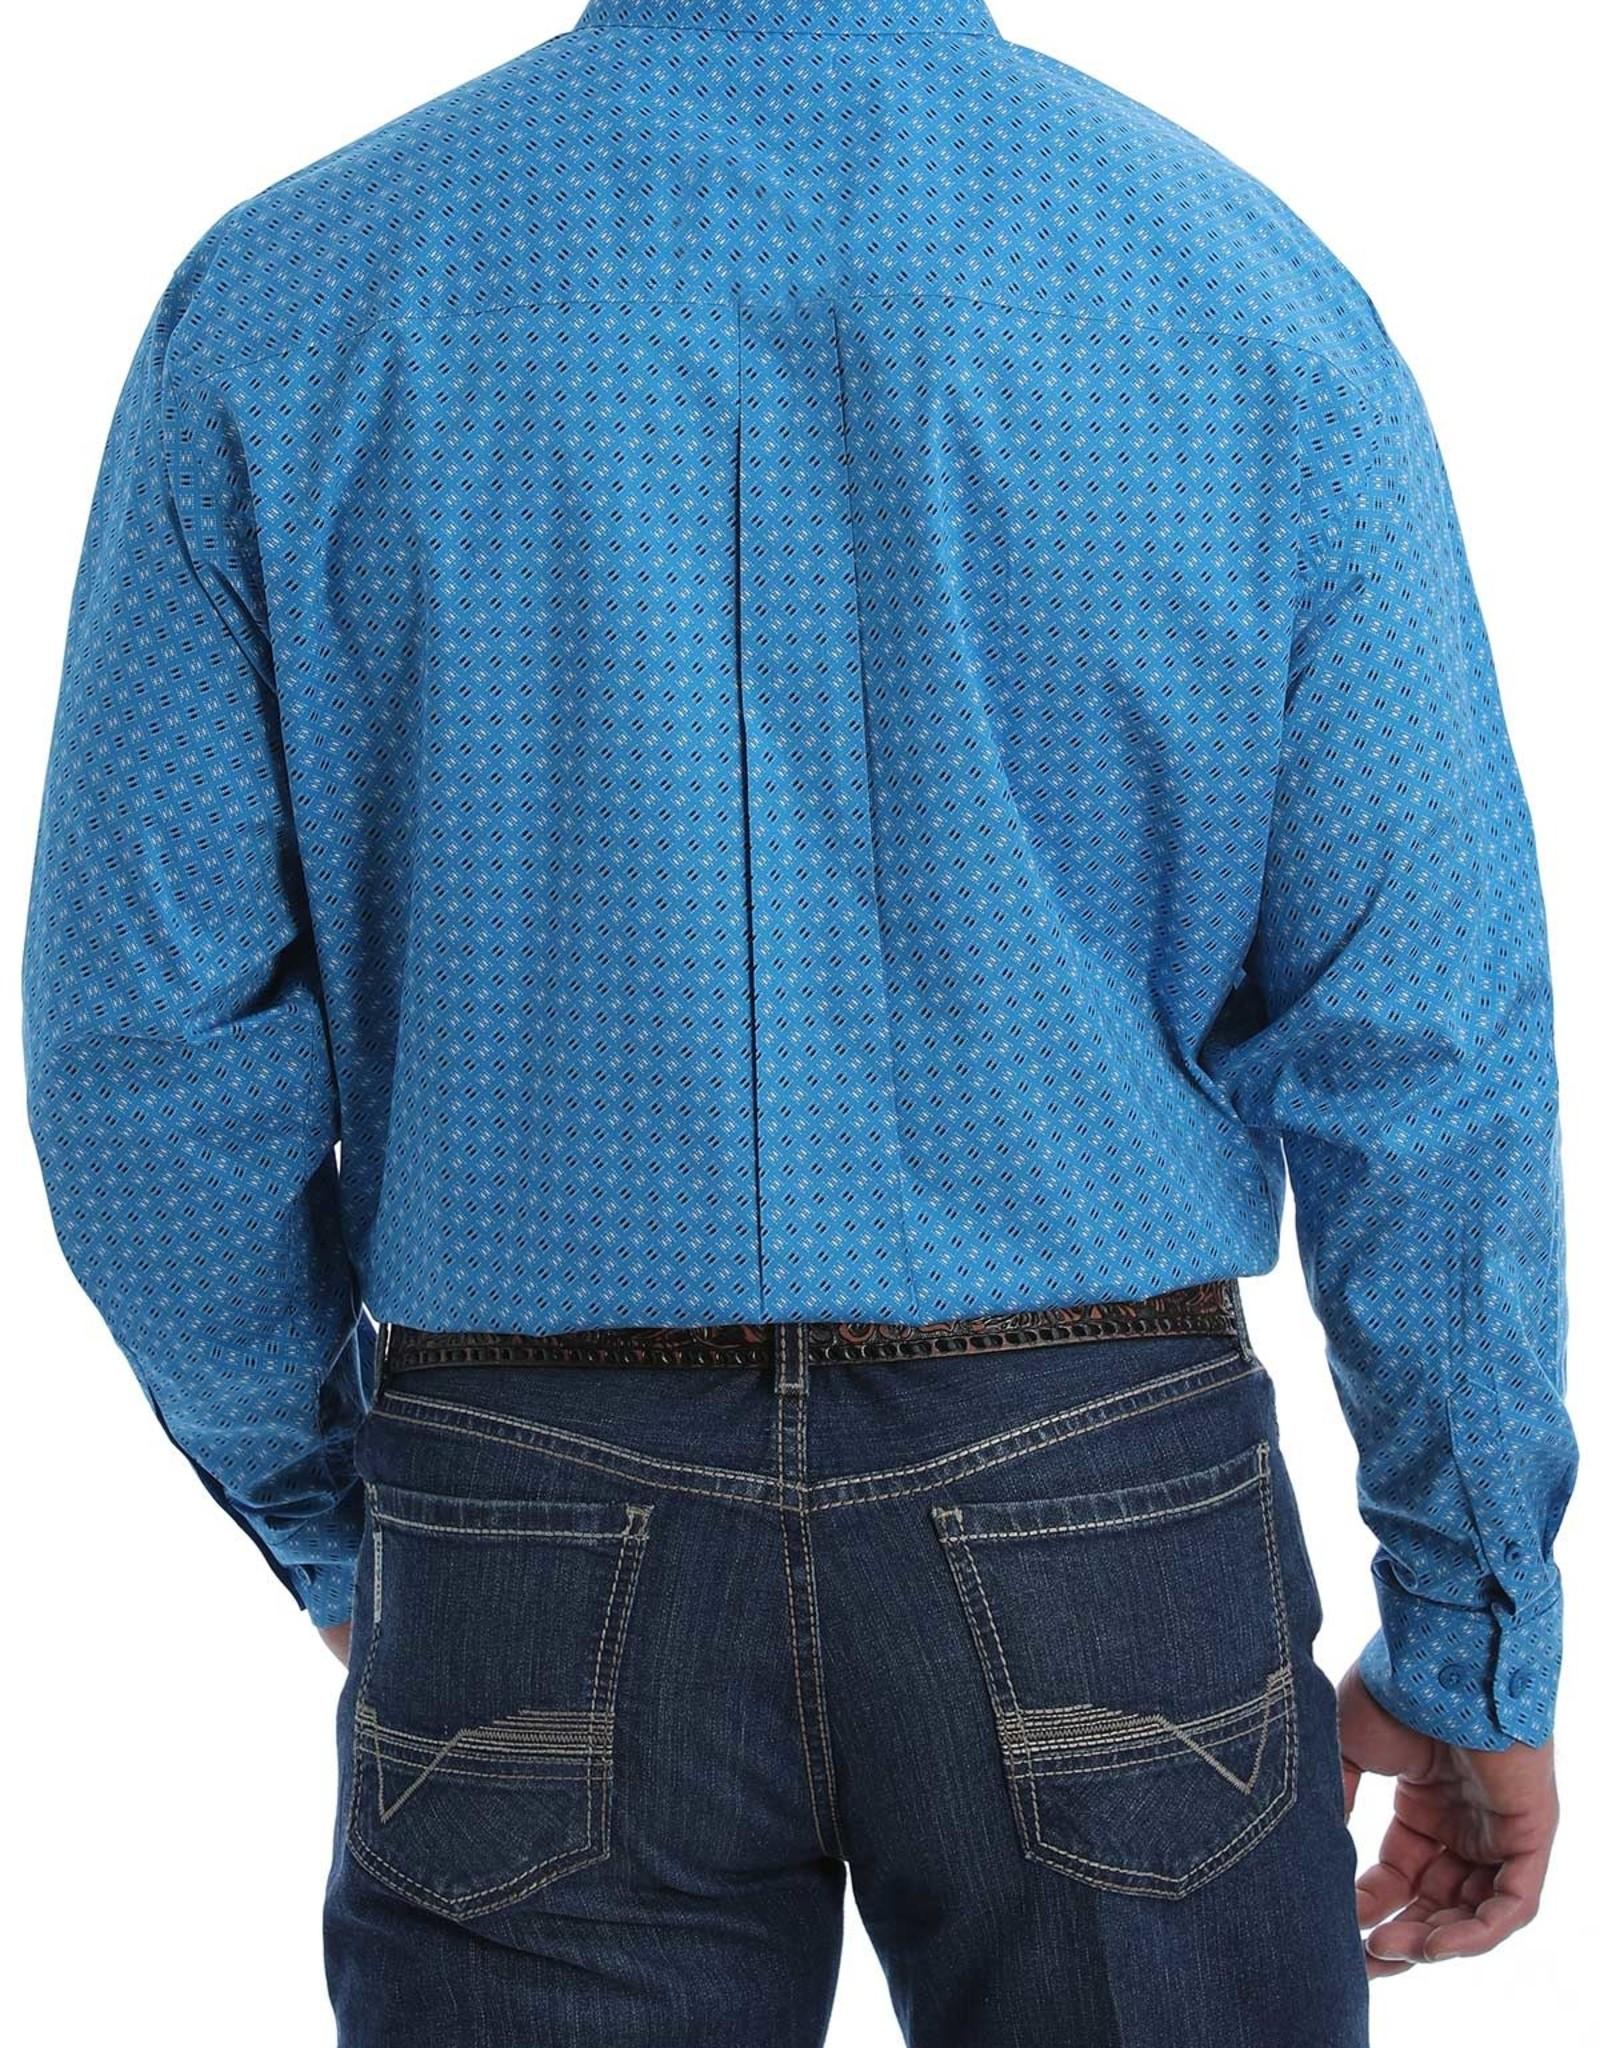 Cinch Mens Cinch Classic Light Blue Black Print Long Sleeve Button Western Shirt